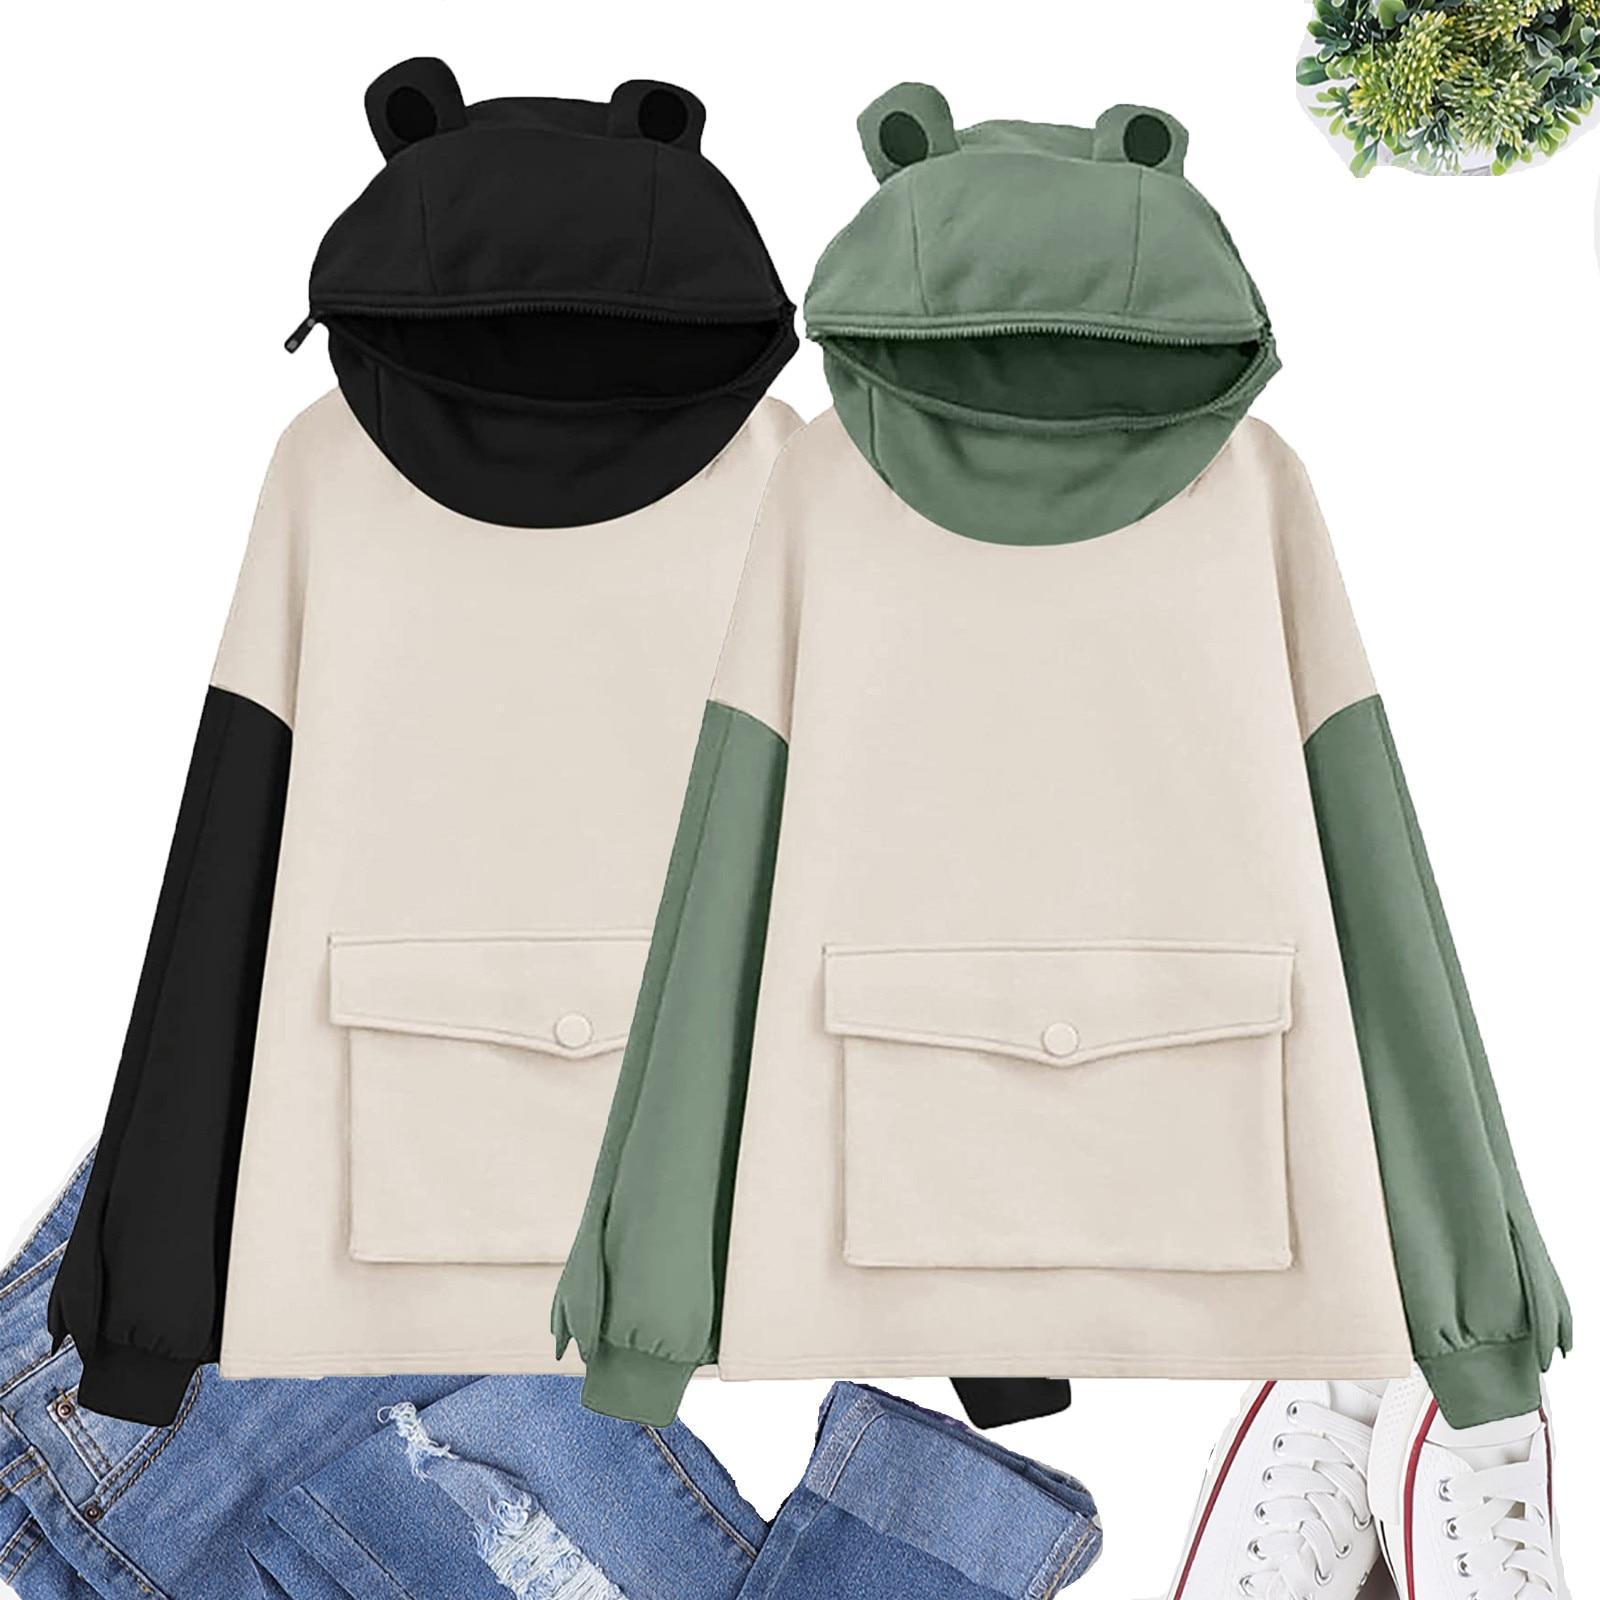 chic hooded long sleeve polka dot pocket design women s hoodie Frogs Hoodie Women Fashion Oversized Harajuku Hooded Sweatshirts Cute Design Print Long Sleeve Pullover Pocket Hoodies Tops N4